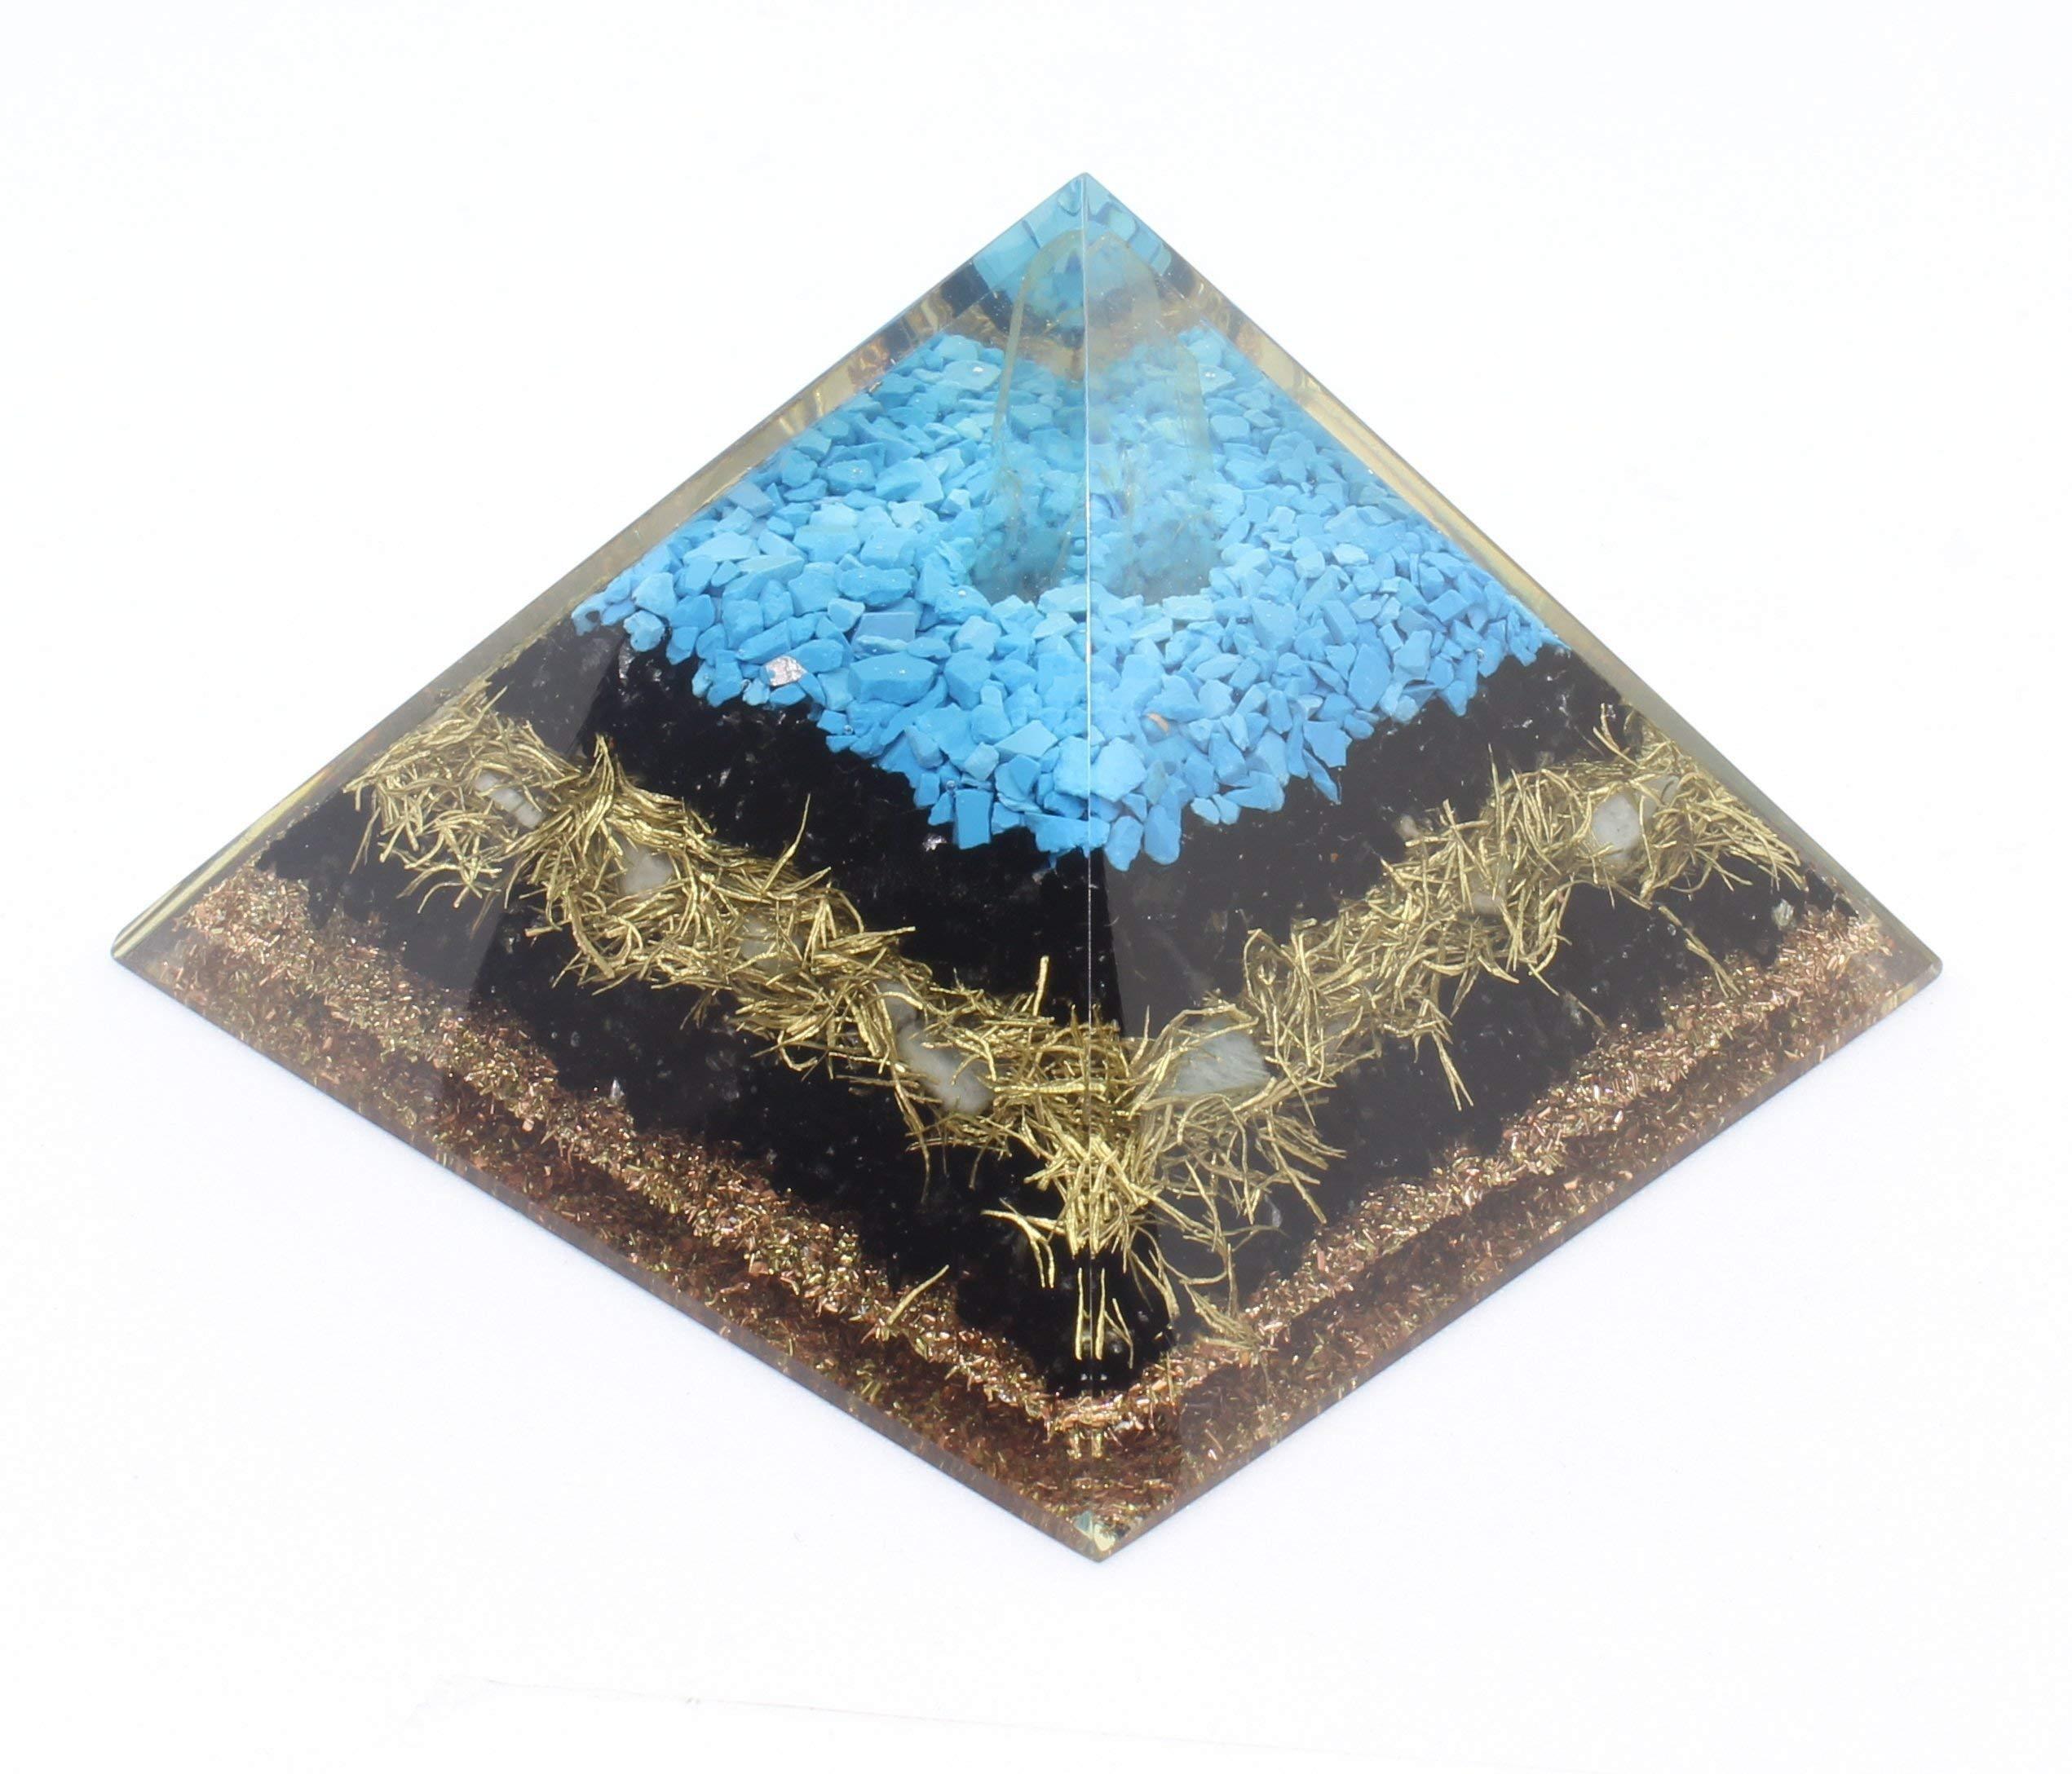 Orgone Pyramid Energy Generator Turquoise Black Tourmaline Pyramid for Emf Protection Detoxification Meditation Healing Chakra